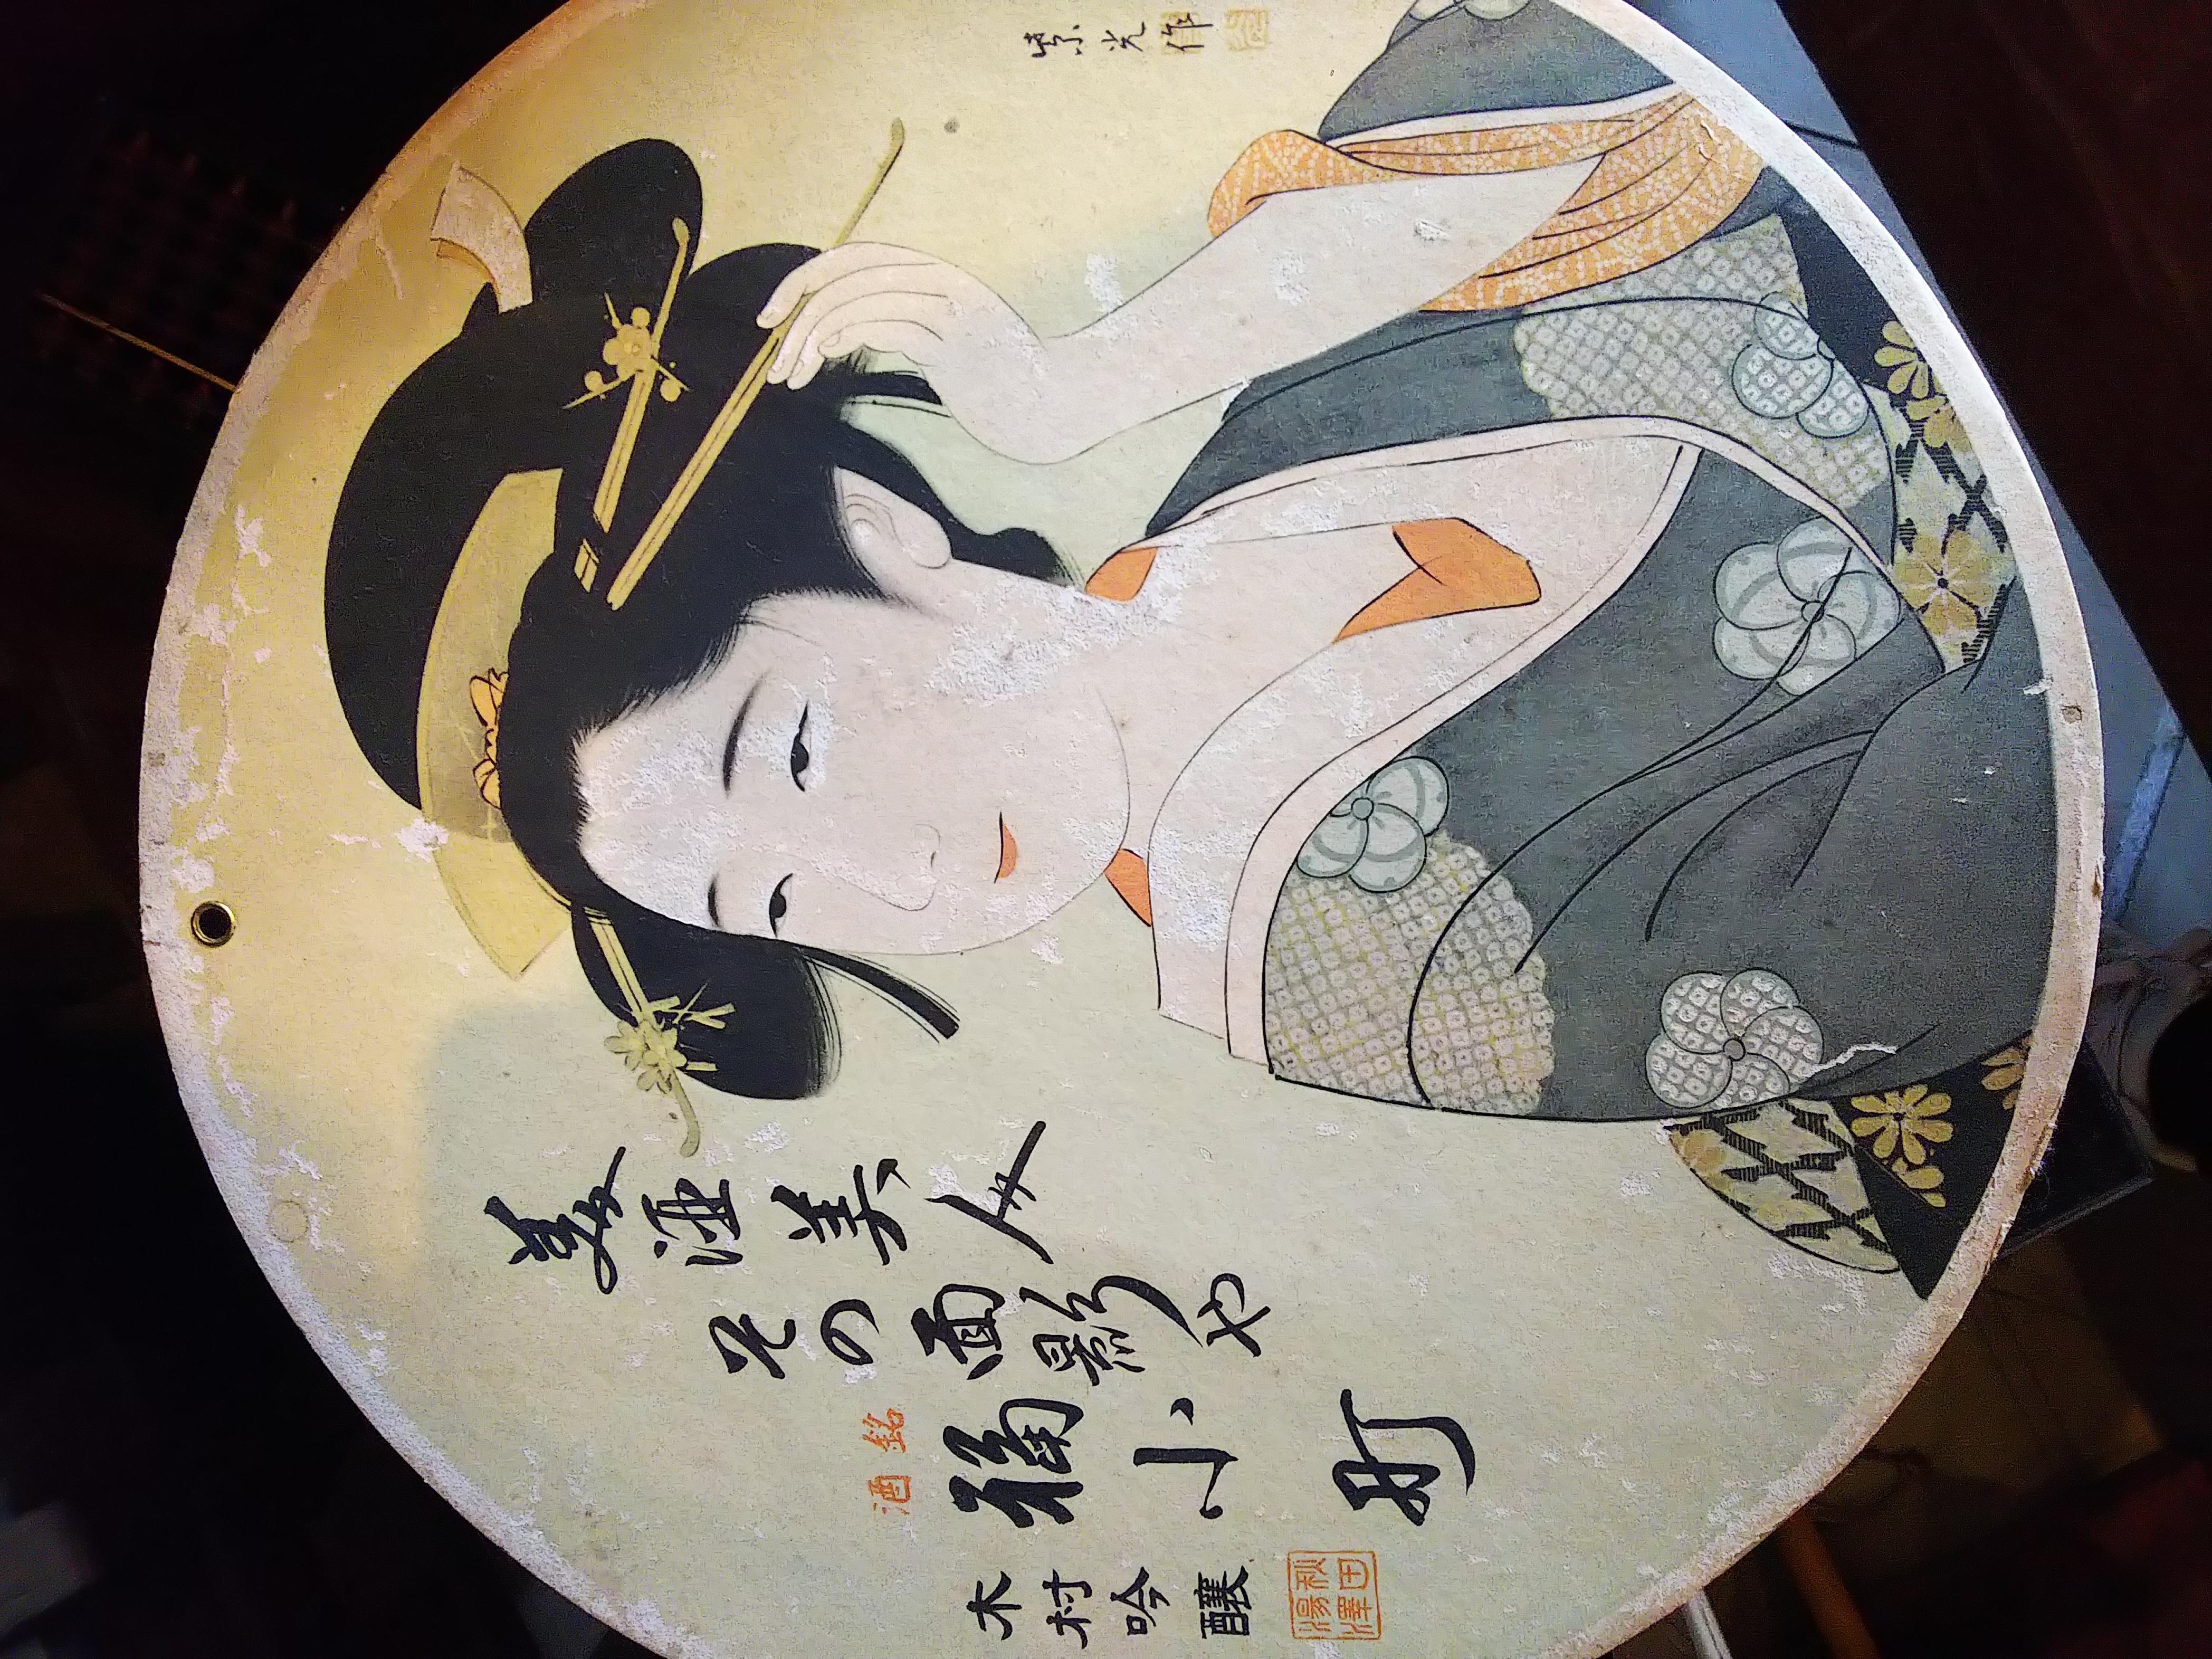 http://www.fukukomachi.com/blog/photo/DSC_0961.JPG